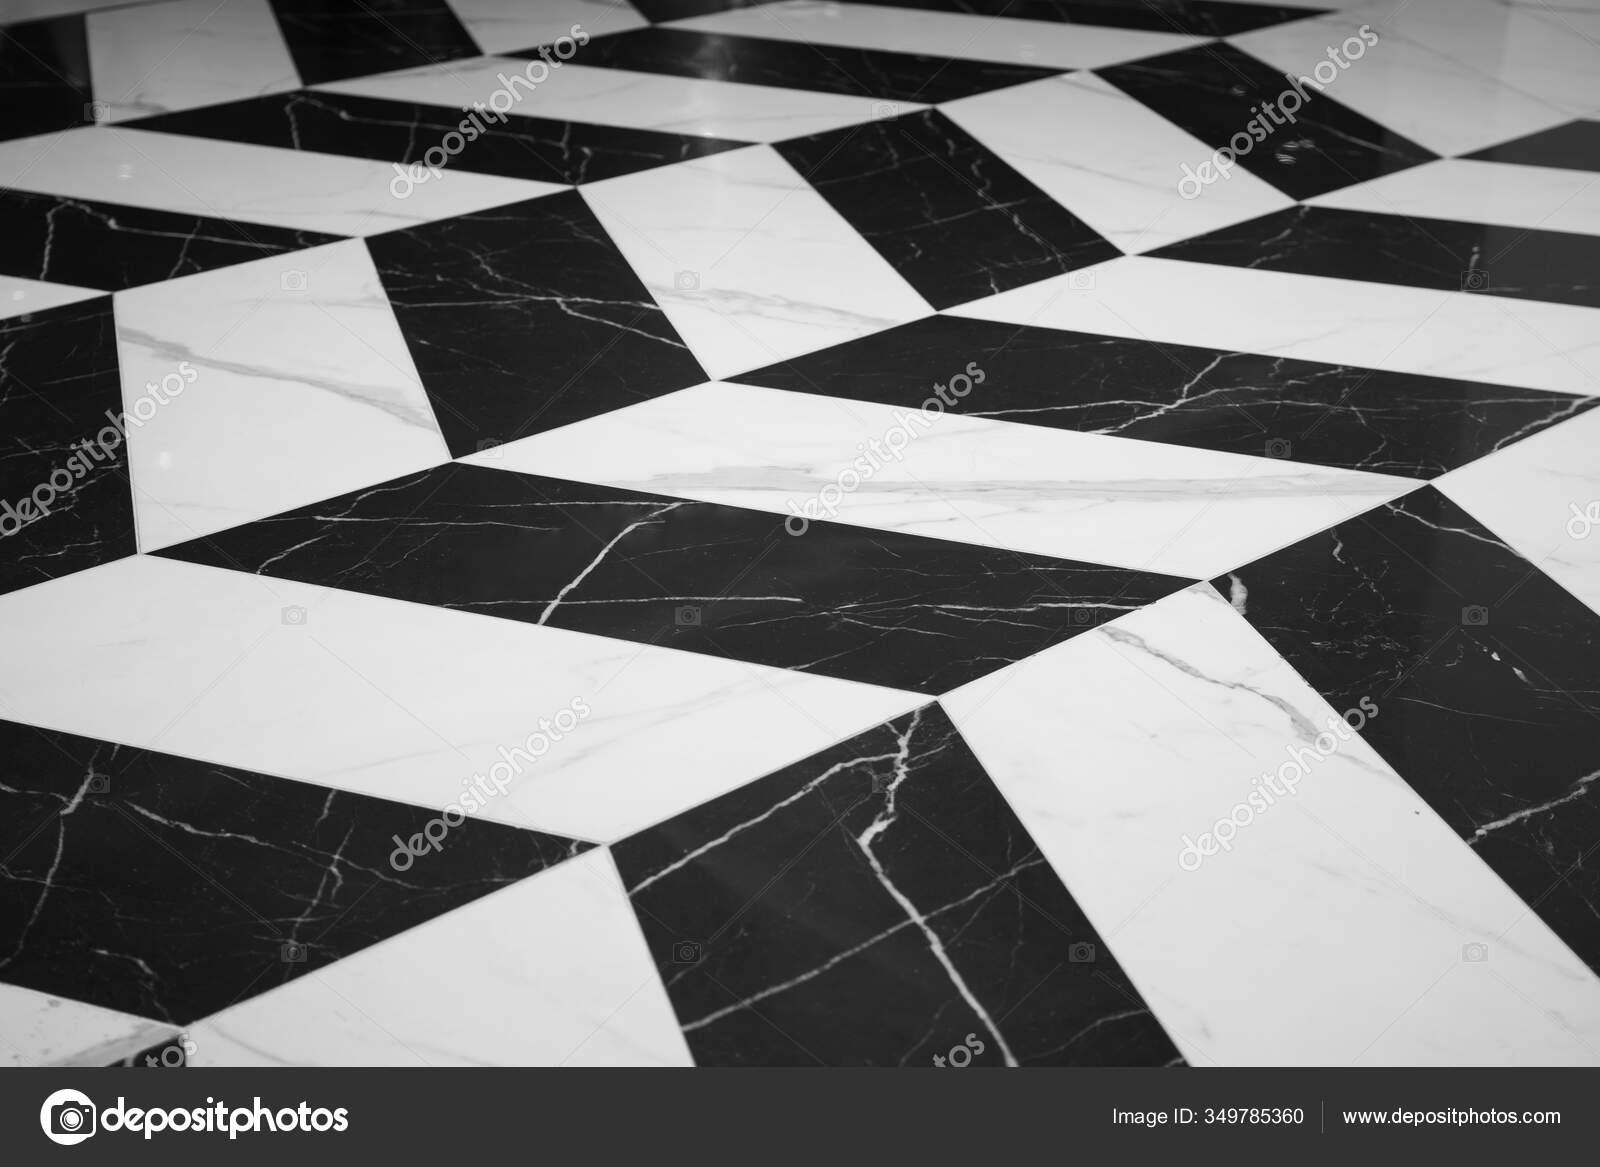 Black White Marble Texture Were Arranged Alternately Create Patterns Interior Stock Photo C Zasabe 349785360